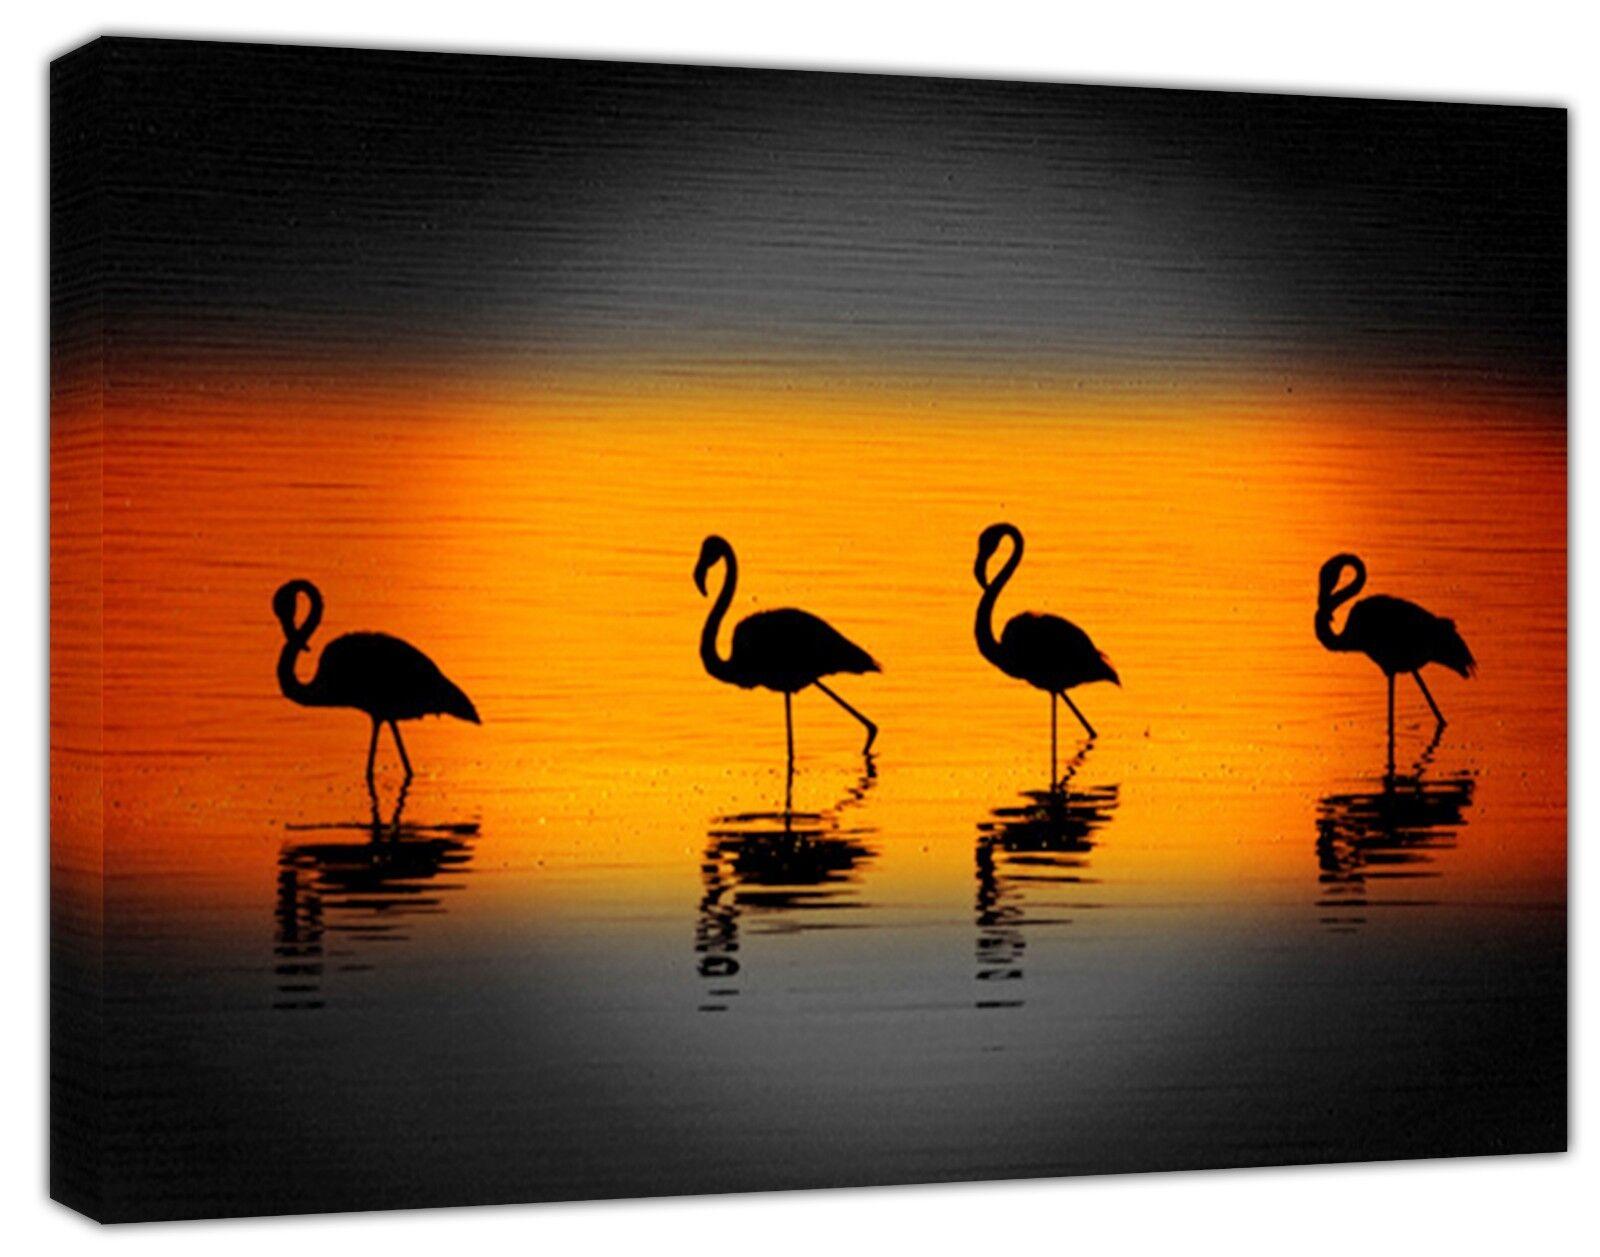 FLAMINGOS FAMILY SUNRISE  PHOTO PRINT ON FRAMED CANVAS  WALL ART HOME DECORATION